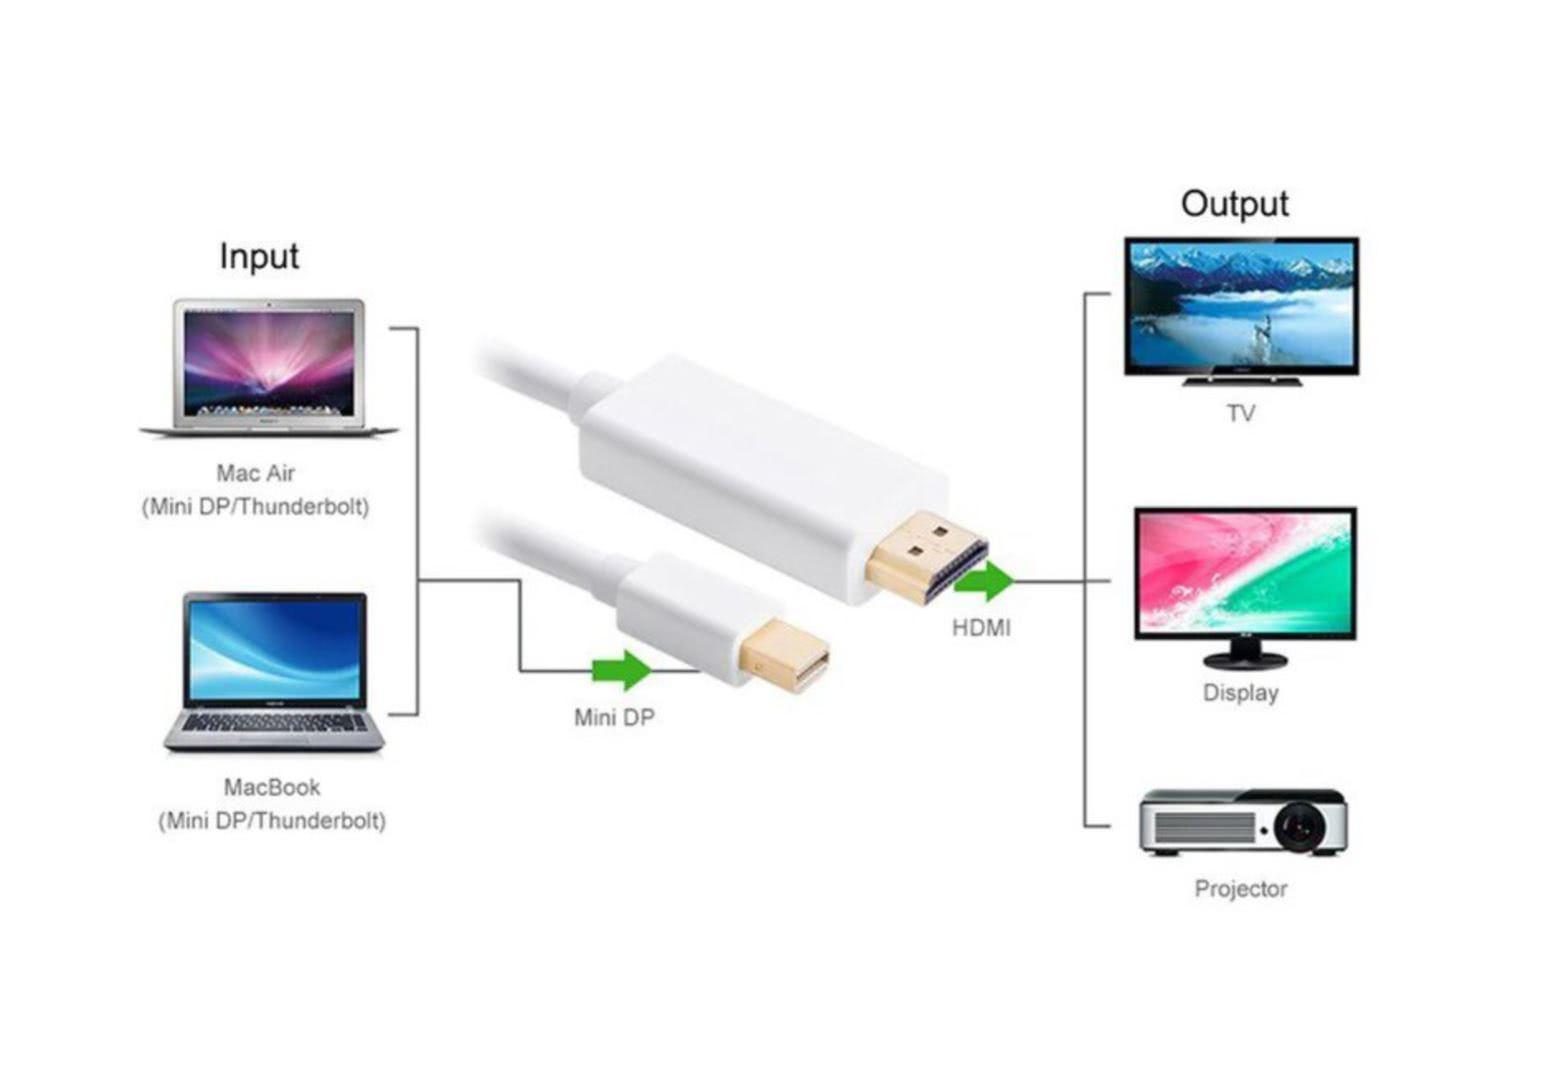 1.8 Meter mini Displayport to HDMI Cable